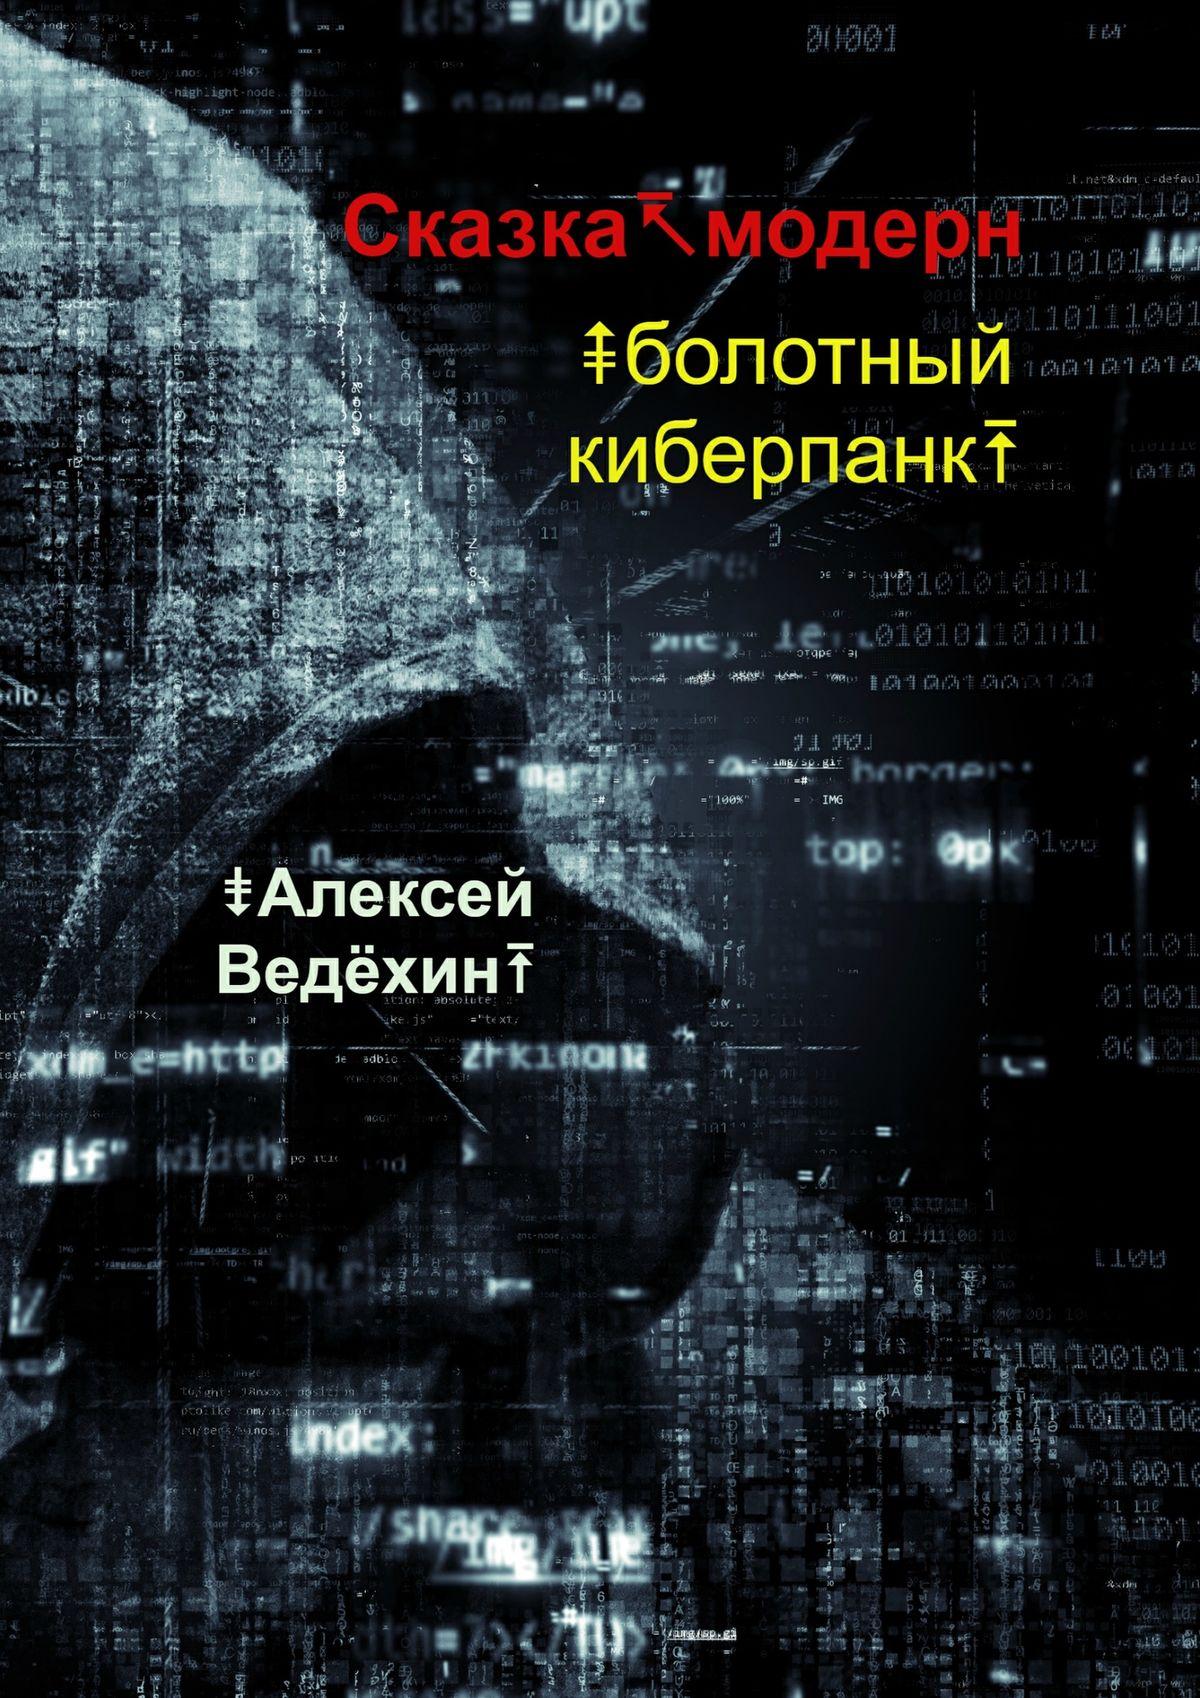 Алексей Ведёхин Сказка-модерн. Болотный киберпанк алексей ведёхин сказка модерн болотный киберпанк